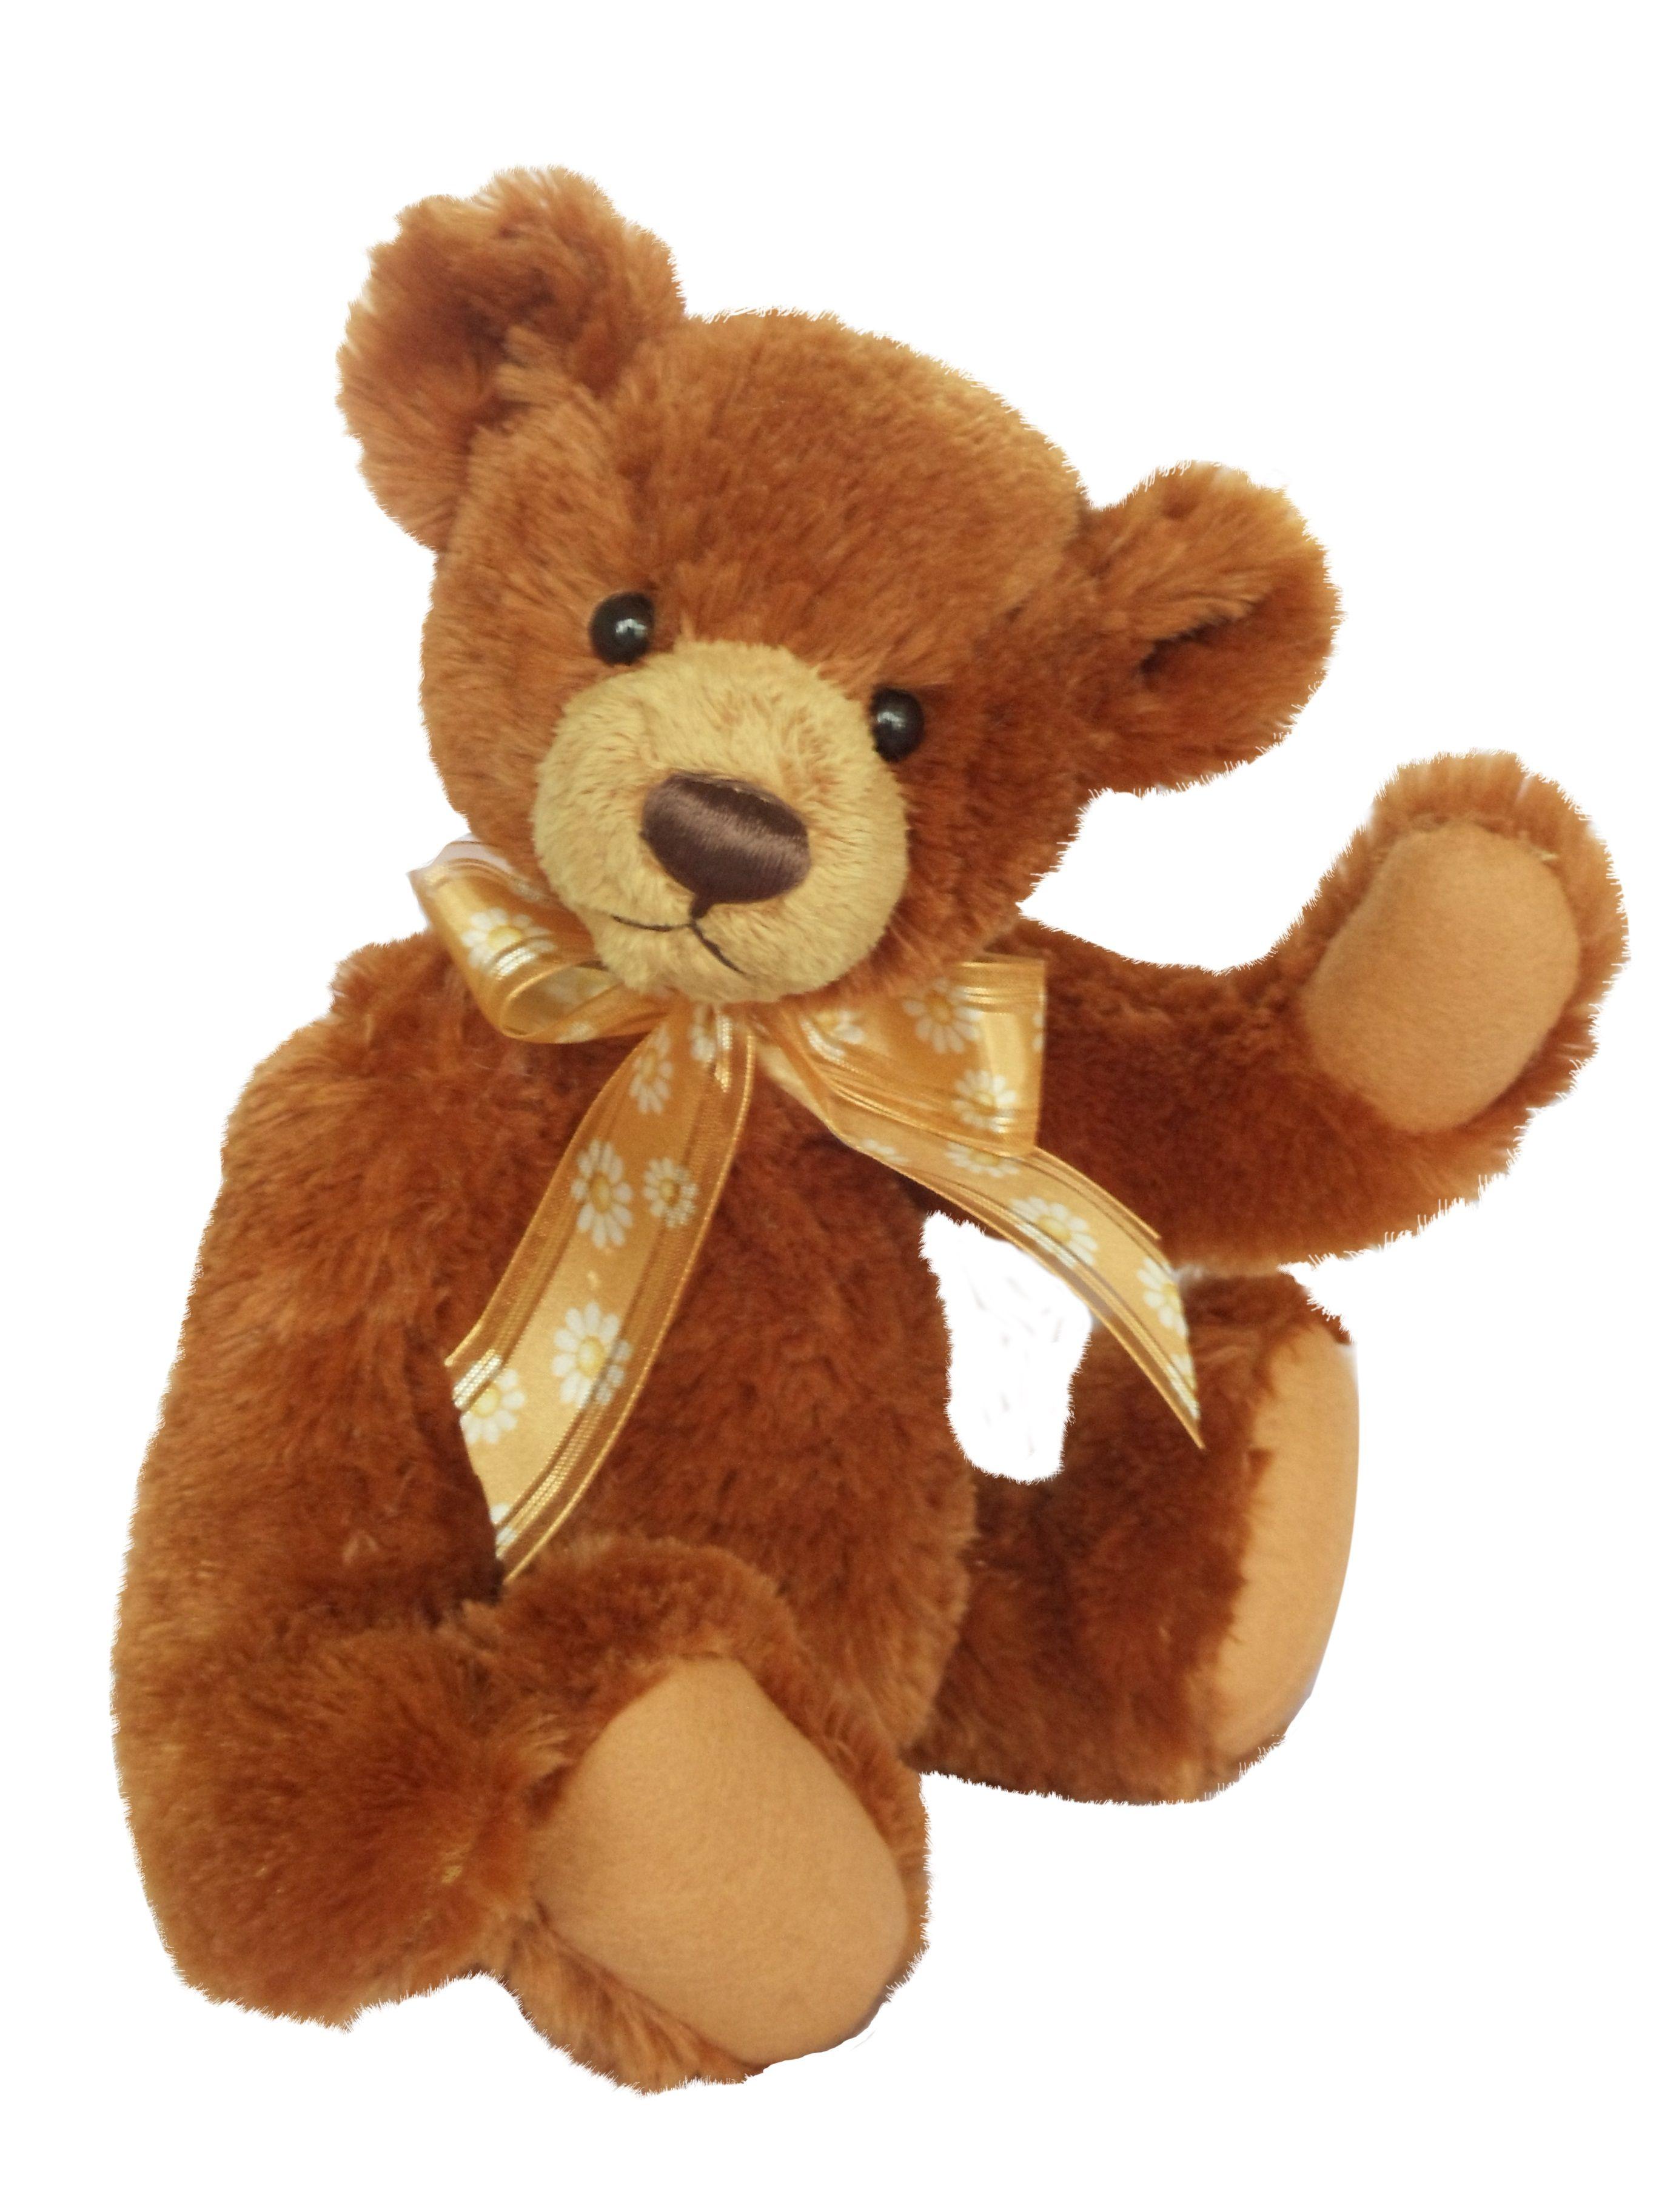 Pin by Lori Gartzke on Bears in my collection   Teddy bear